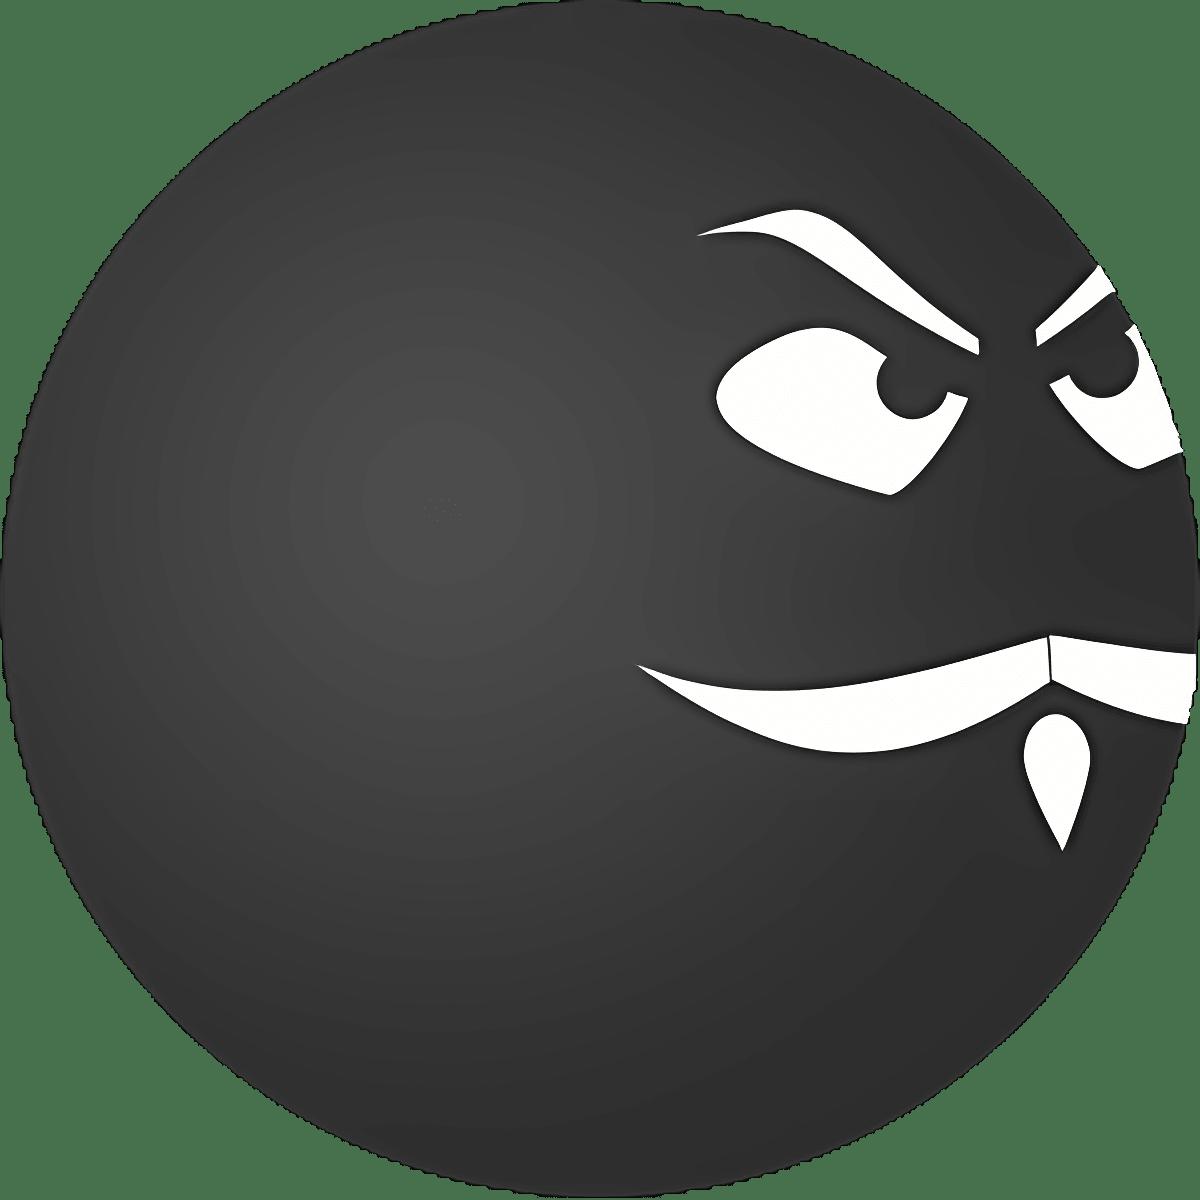 Black Ball - The Bouncing ball